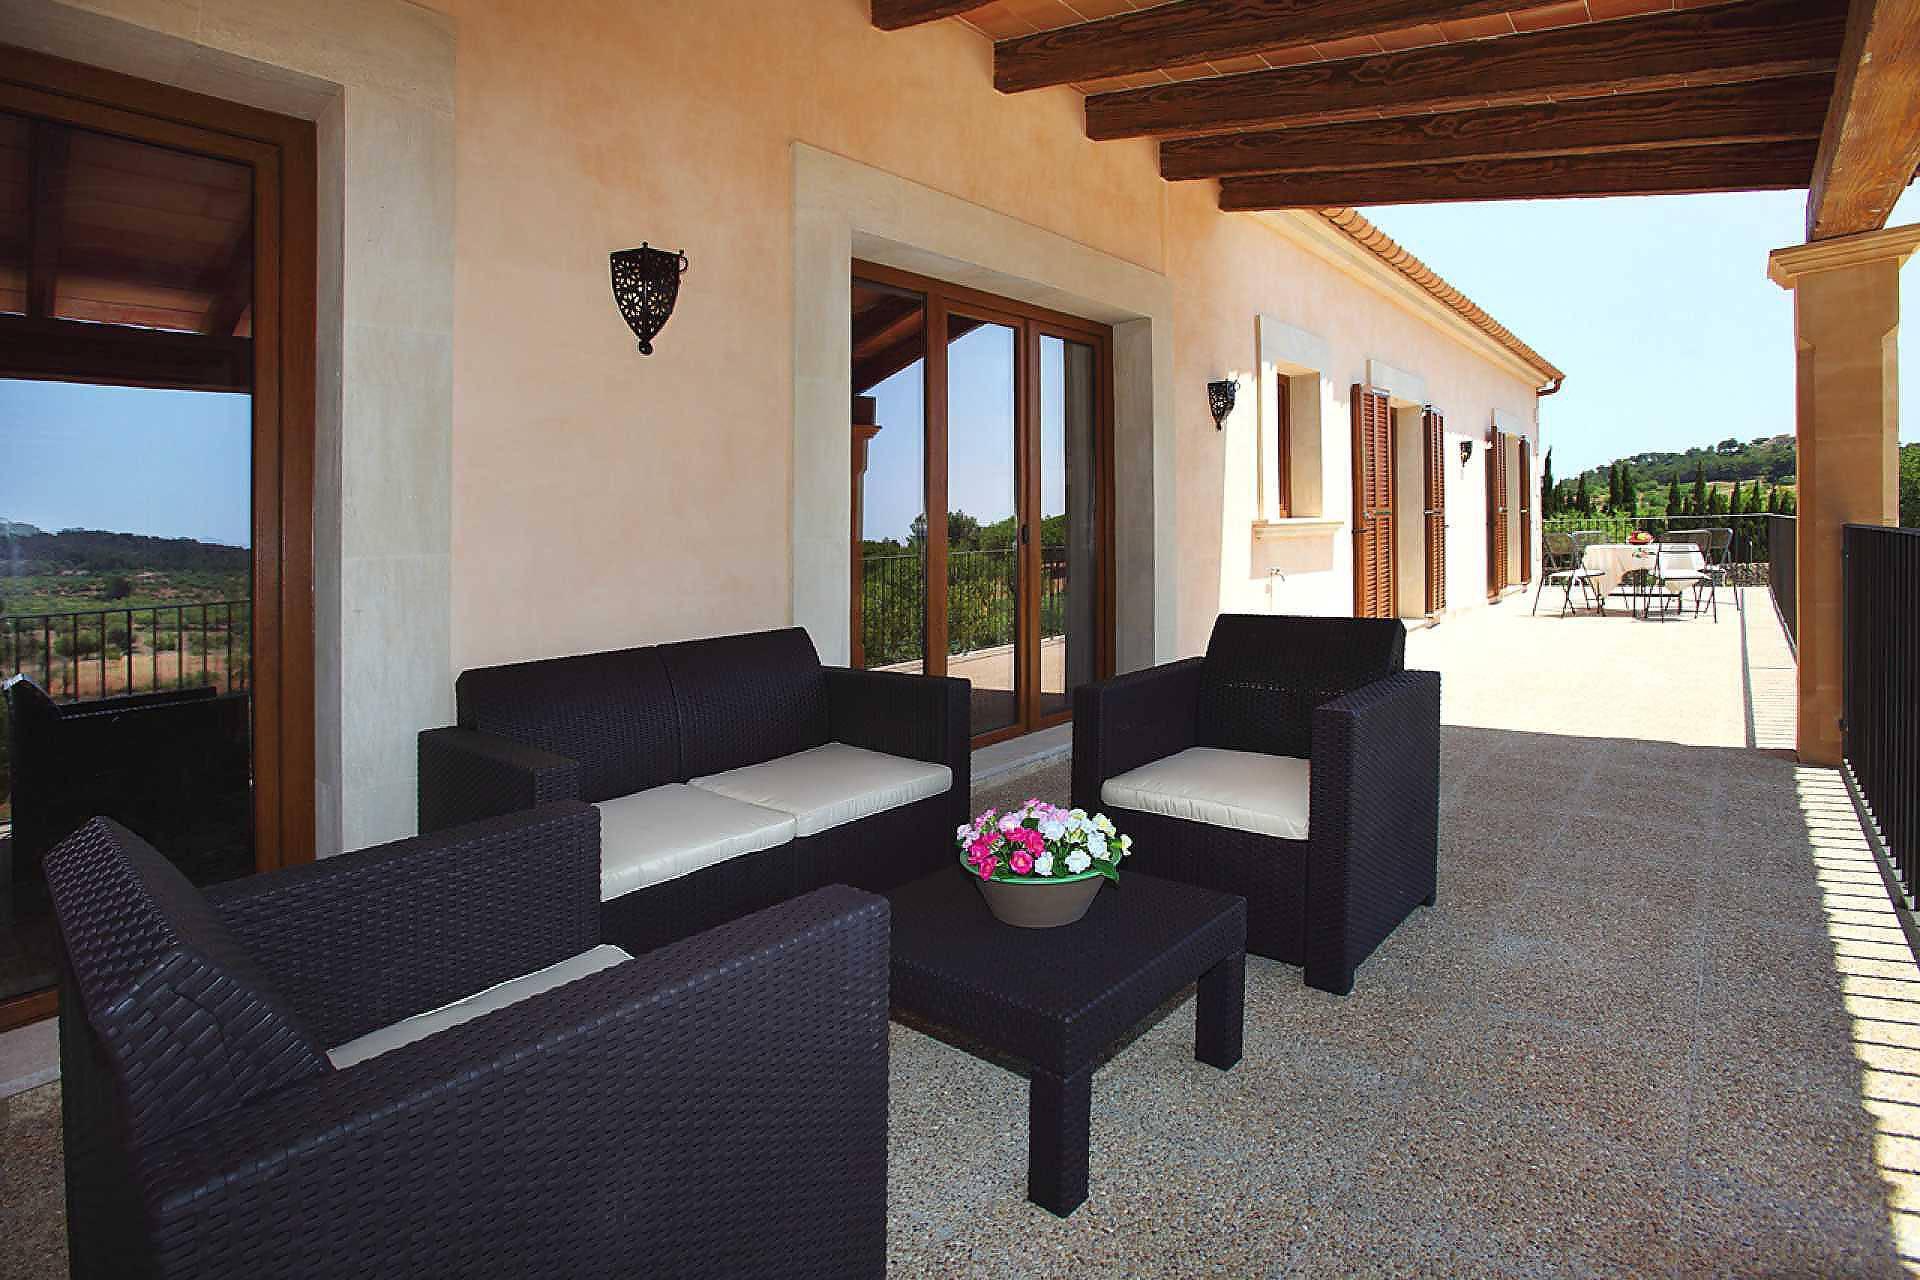 01-45 Exclusive Finca Mallorca East Bild 13